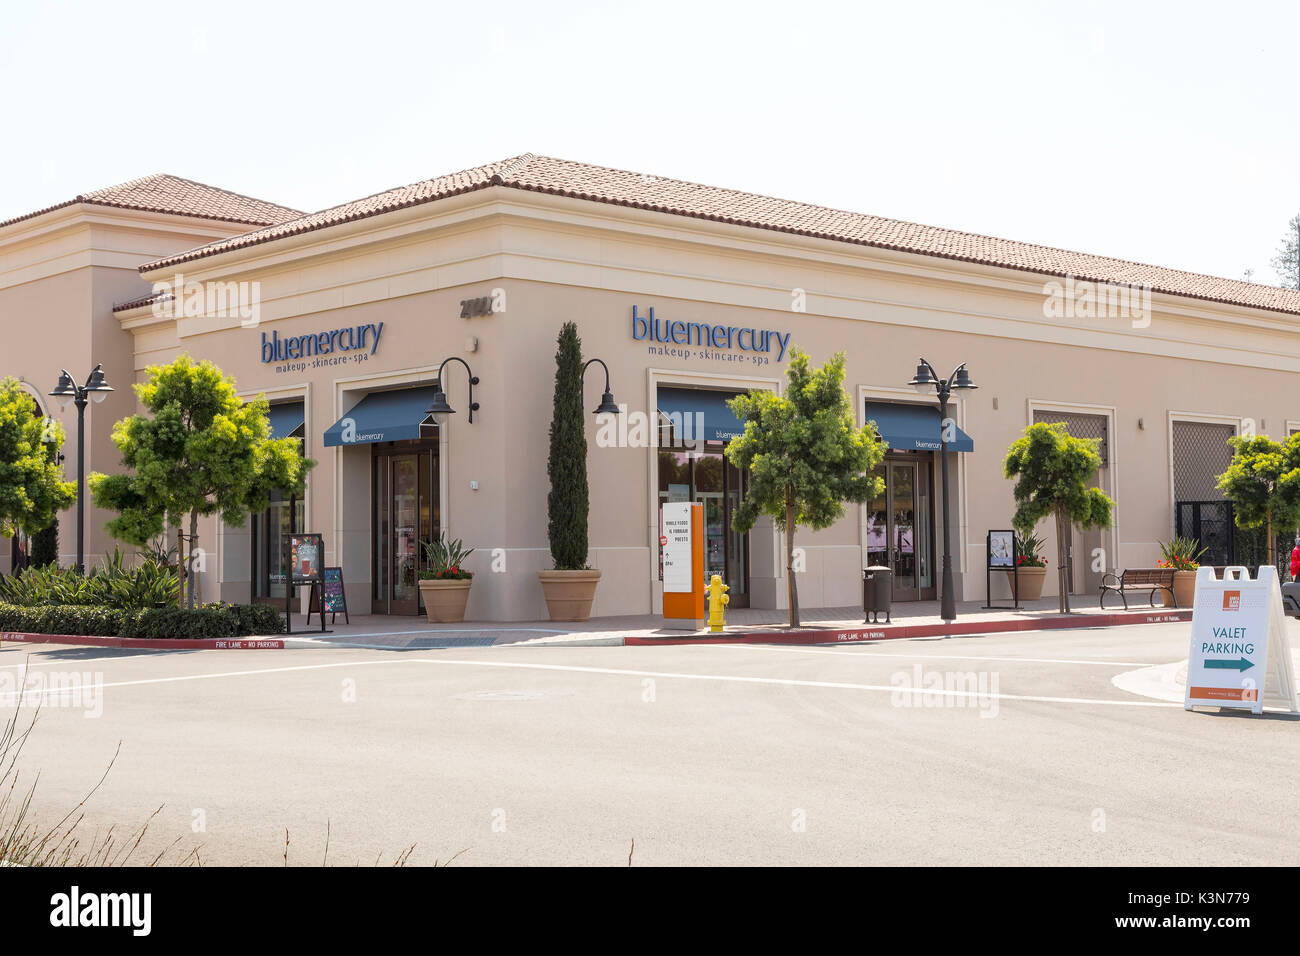 Blue Mercury Store in Sunnyvale, Calif. - Stock Image